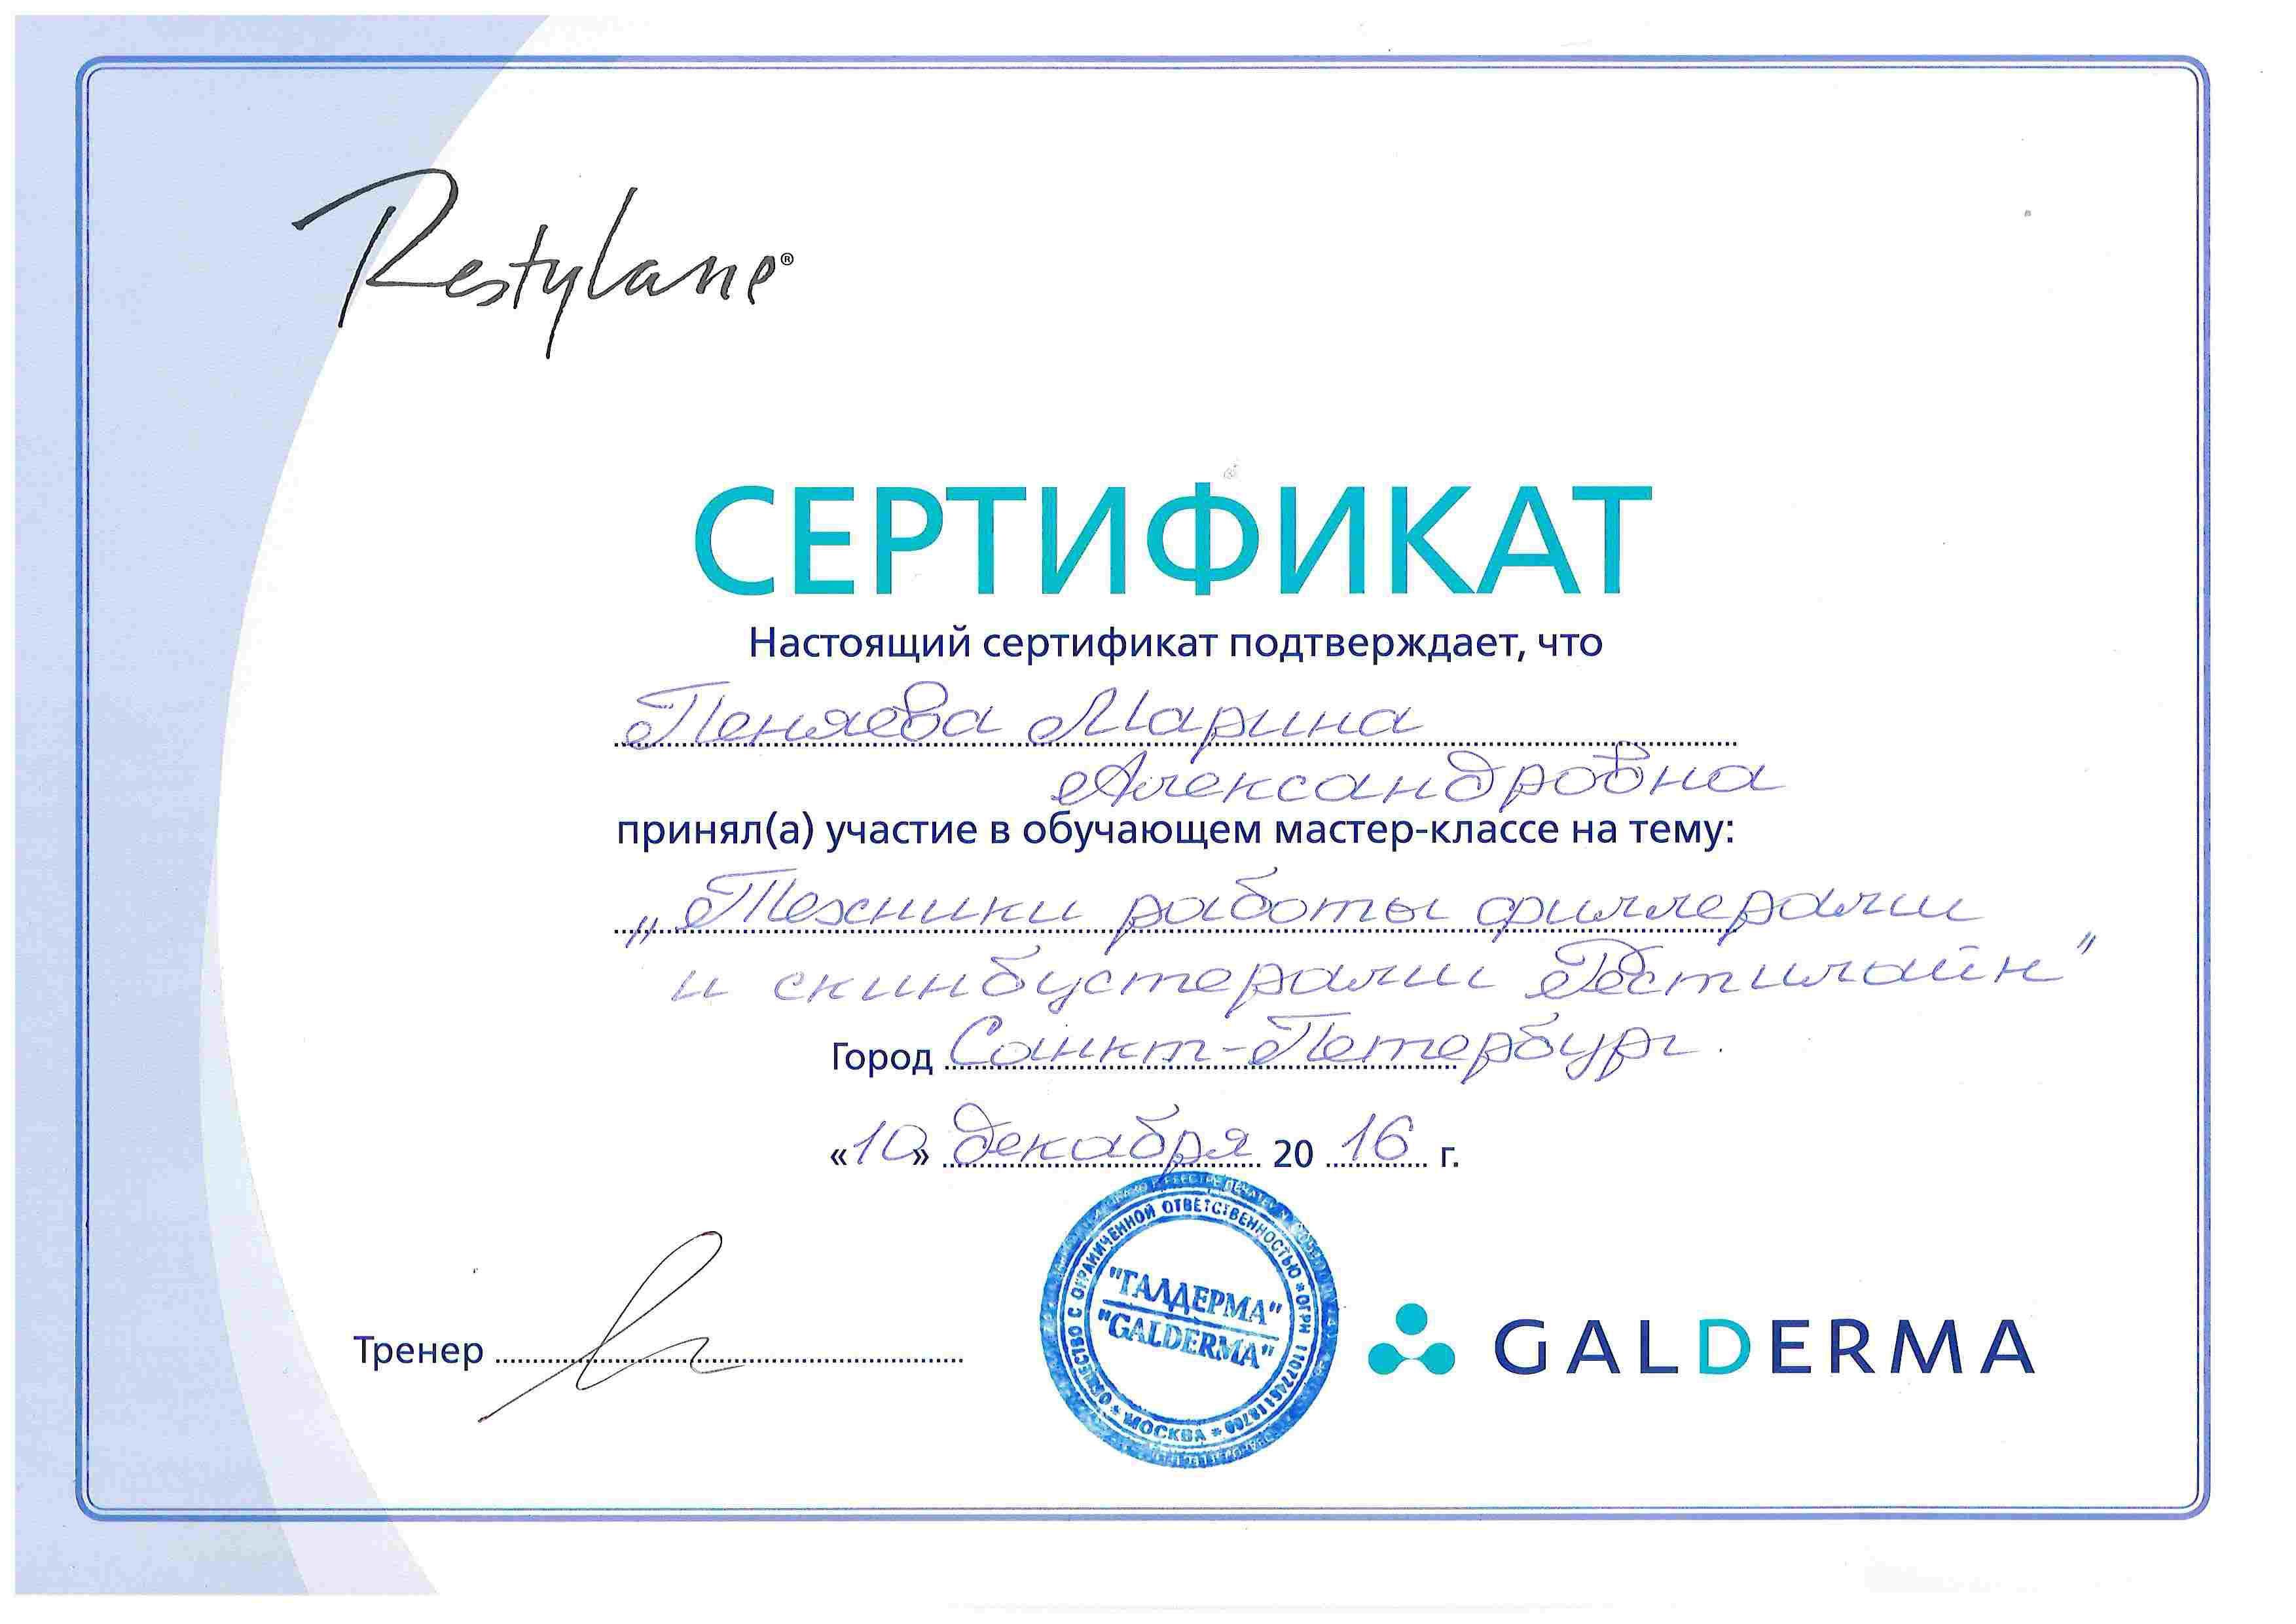 Сертификат Пеняева 4